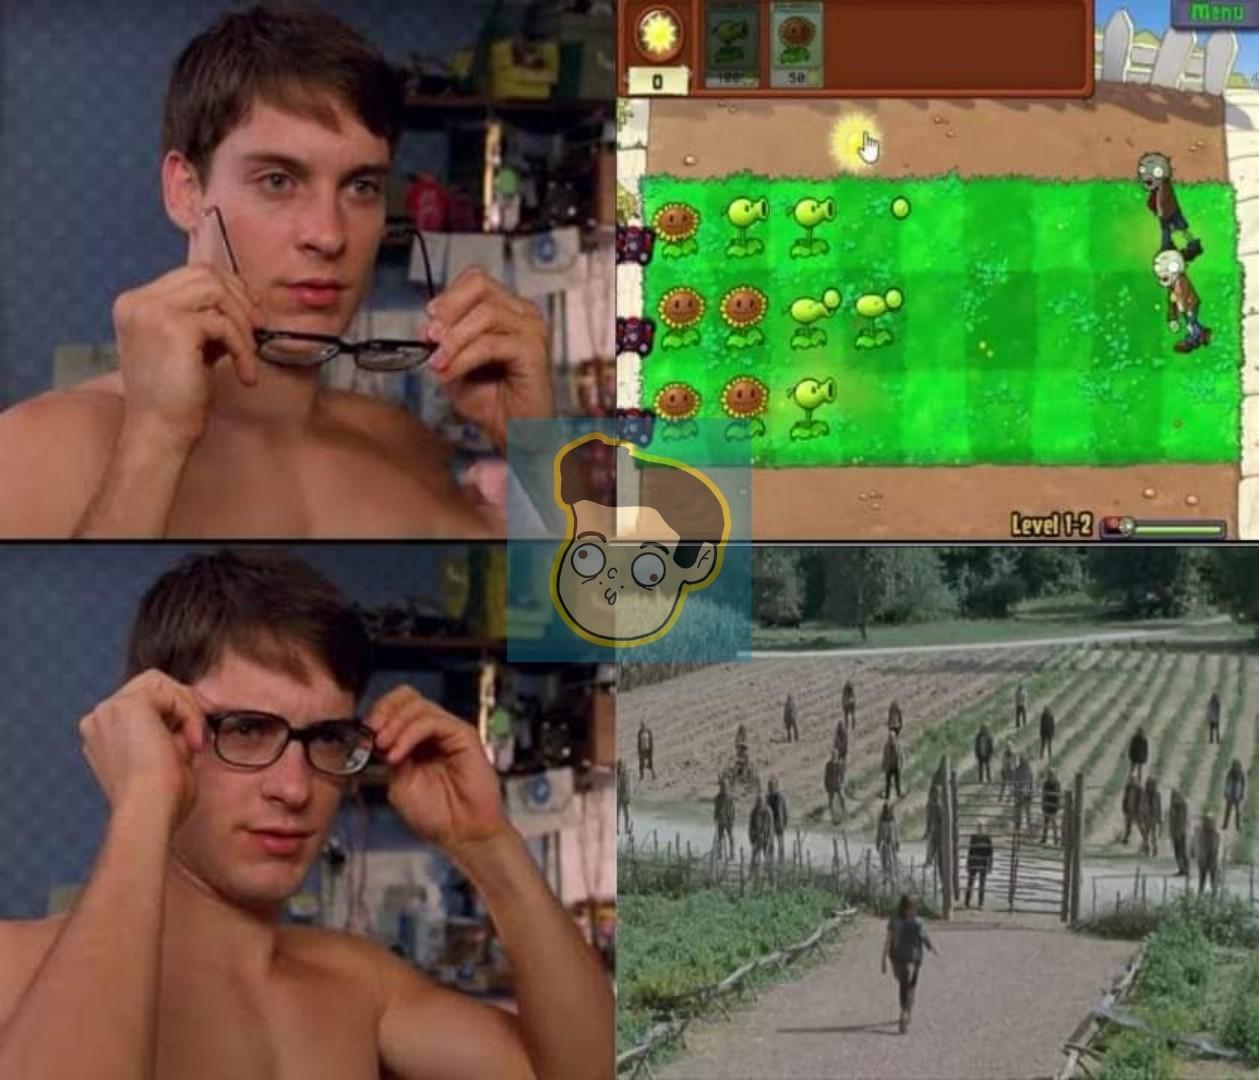 Muy sospechoso - meme